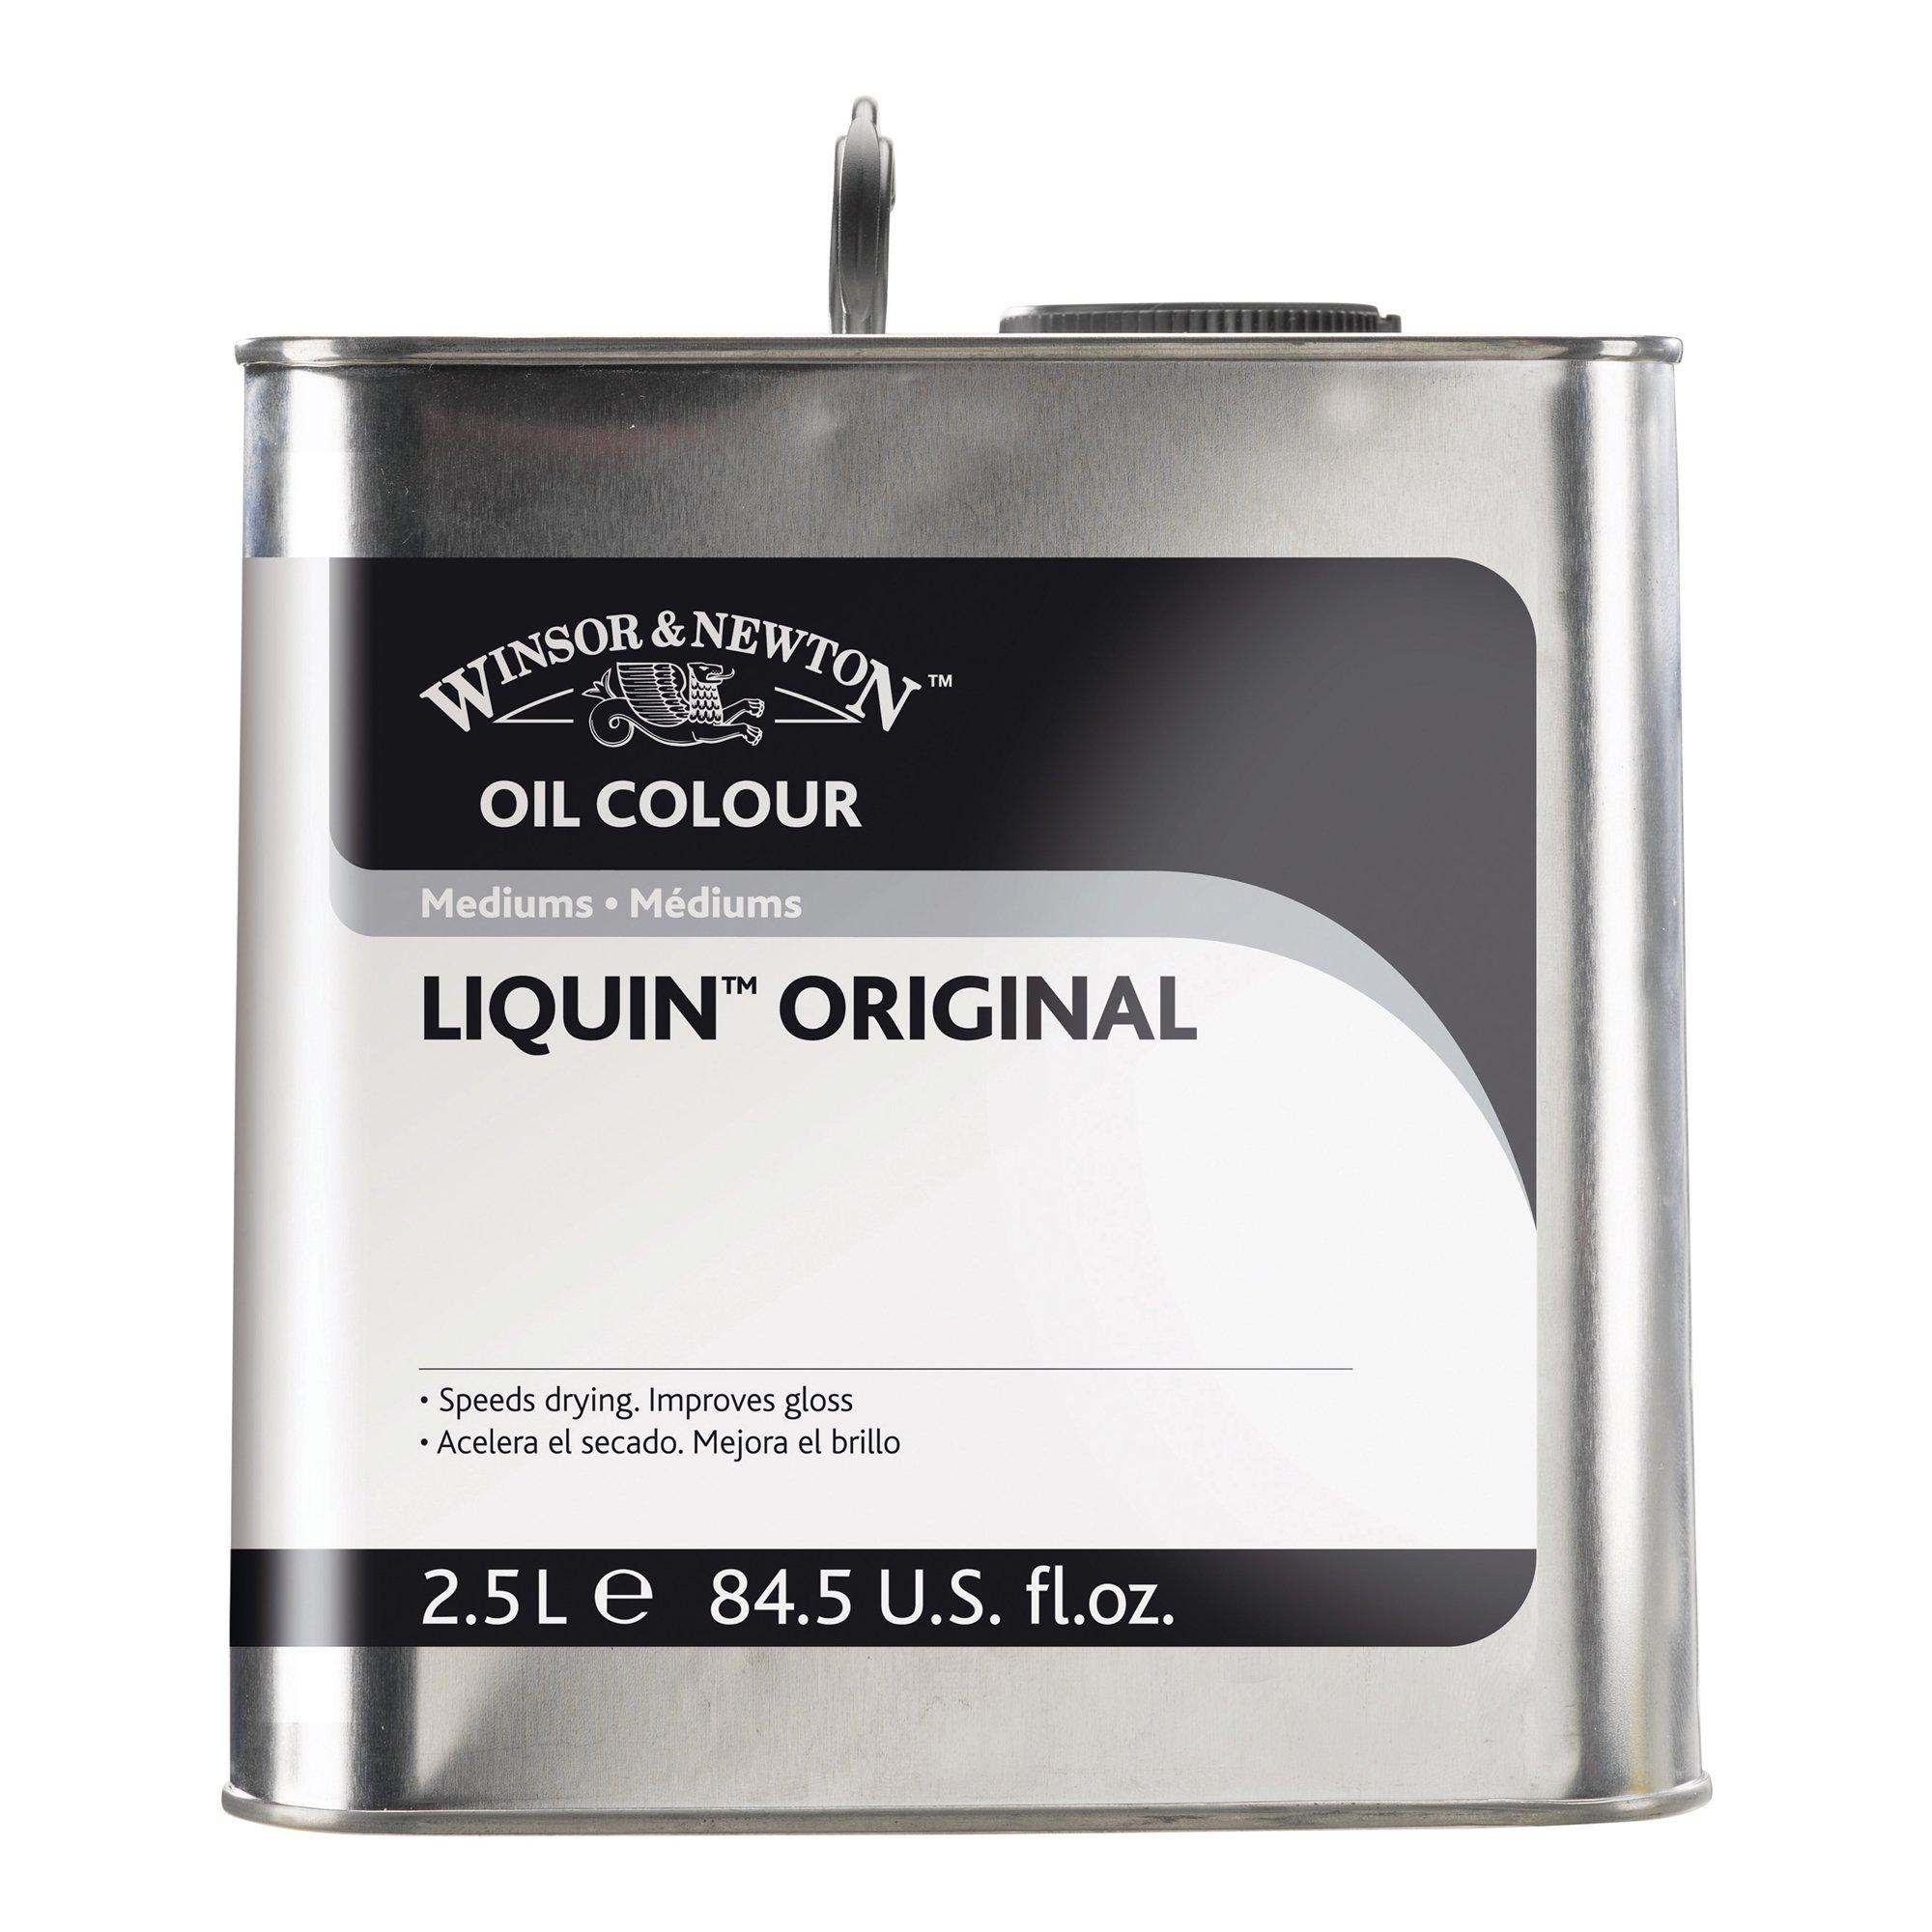 Winsor & Newton Liquin Original, 2.5 Liter by Winsor & Newton